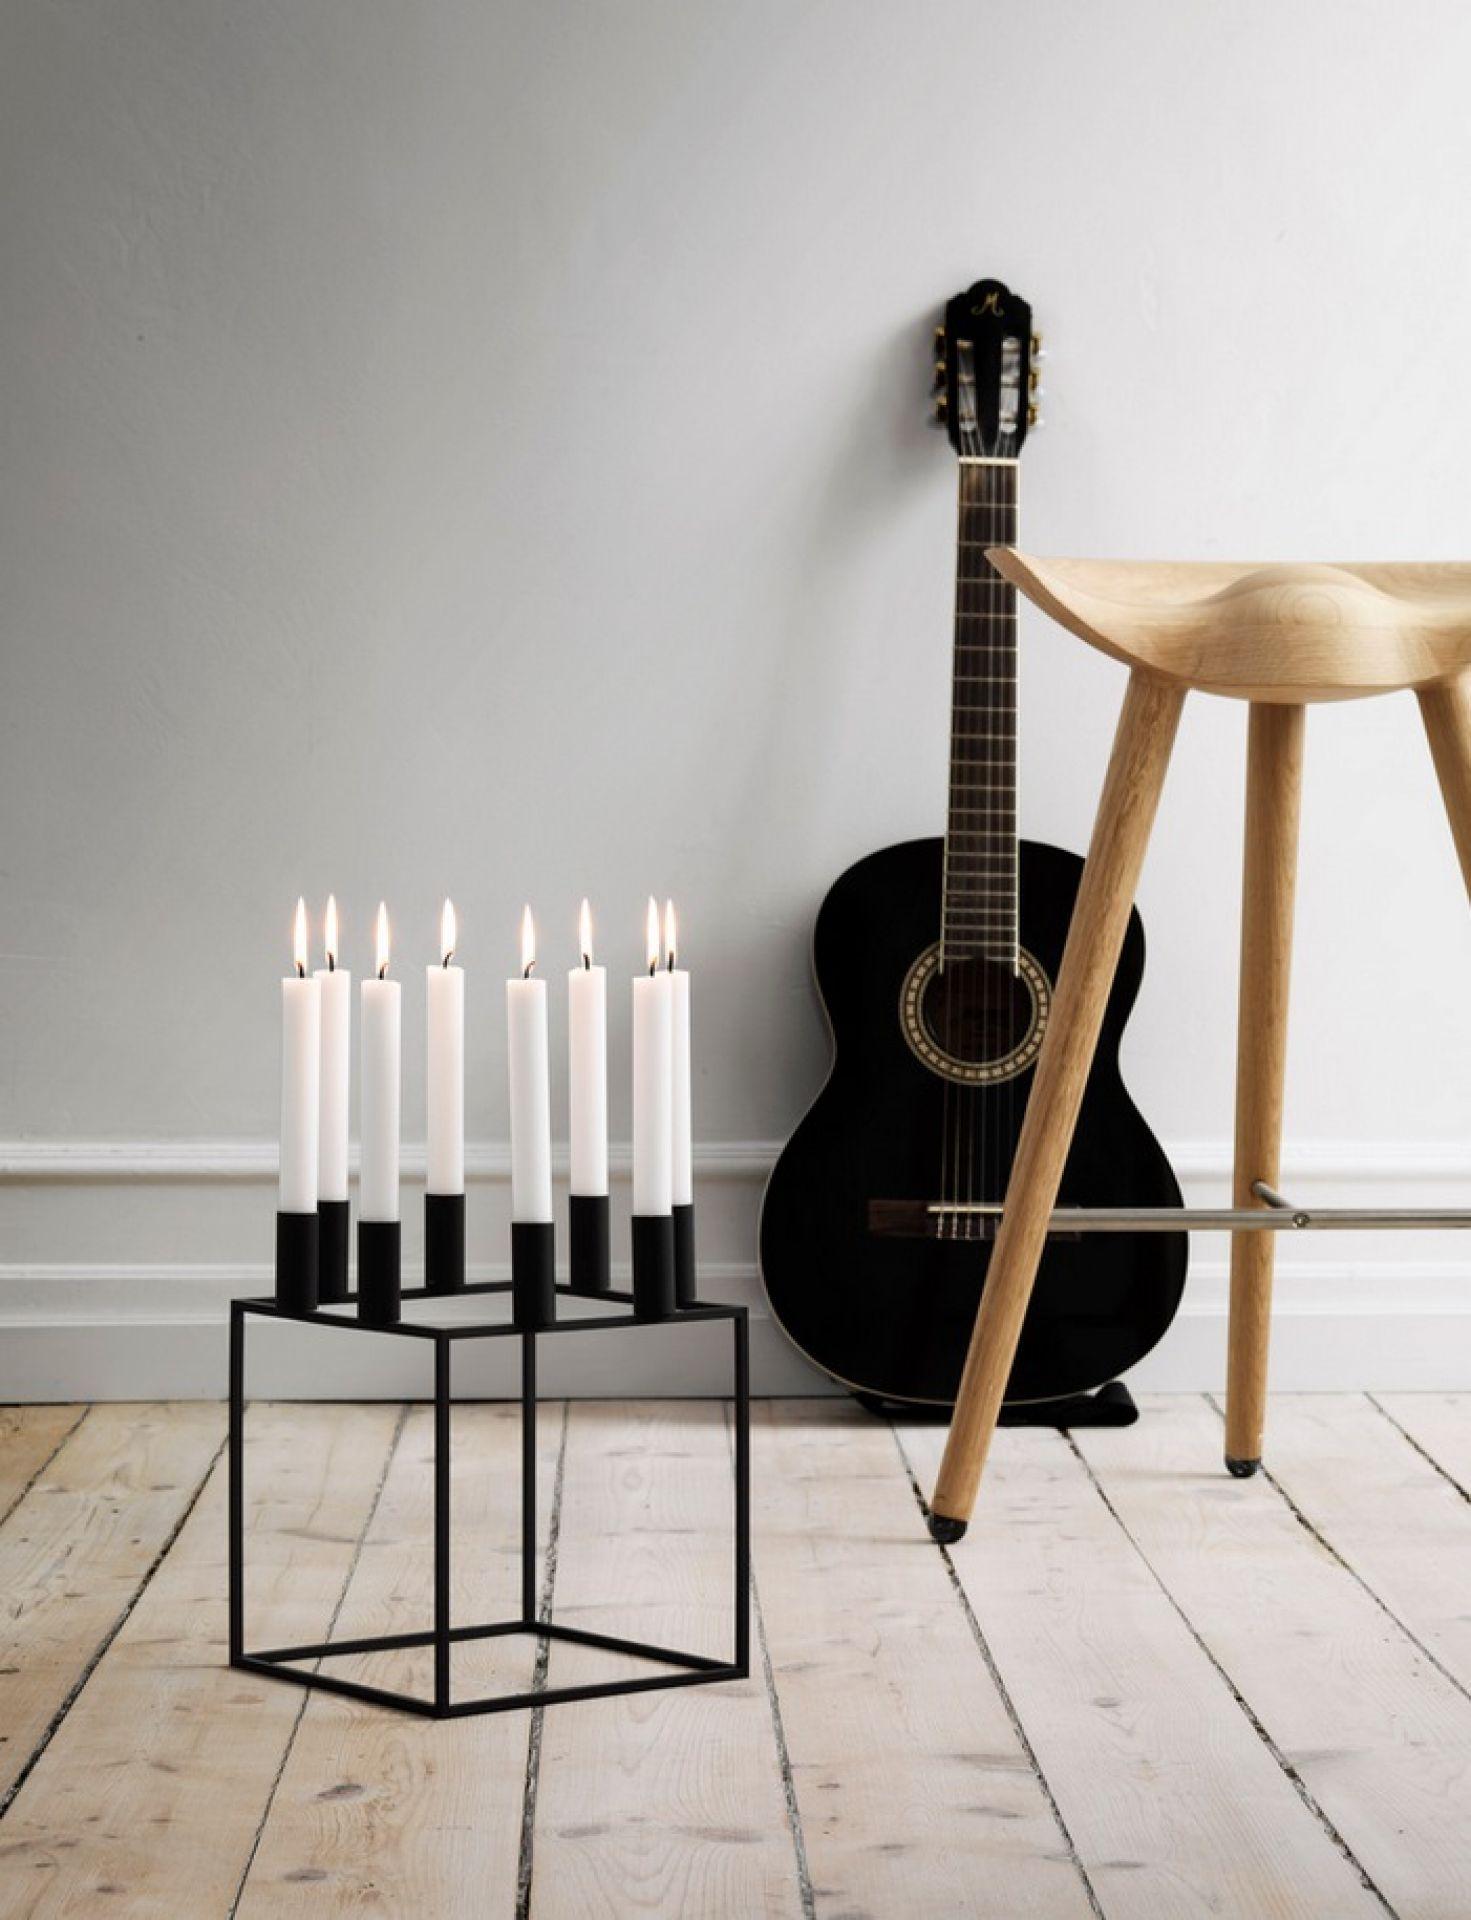 Kubus 8 candleholder by Lassen